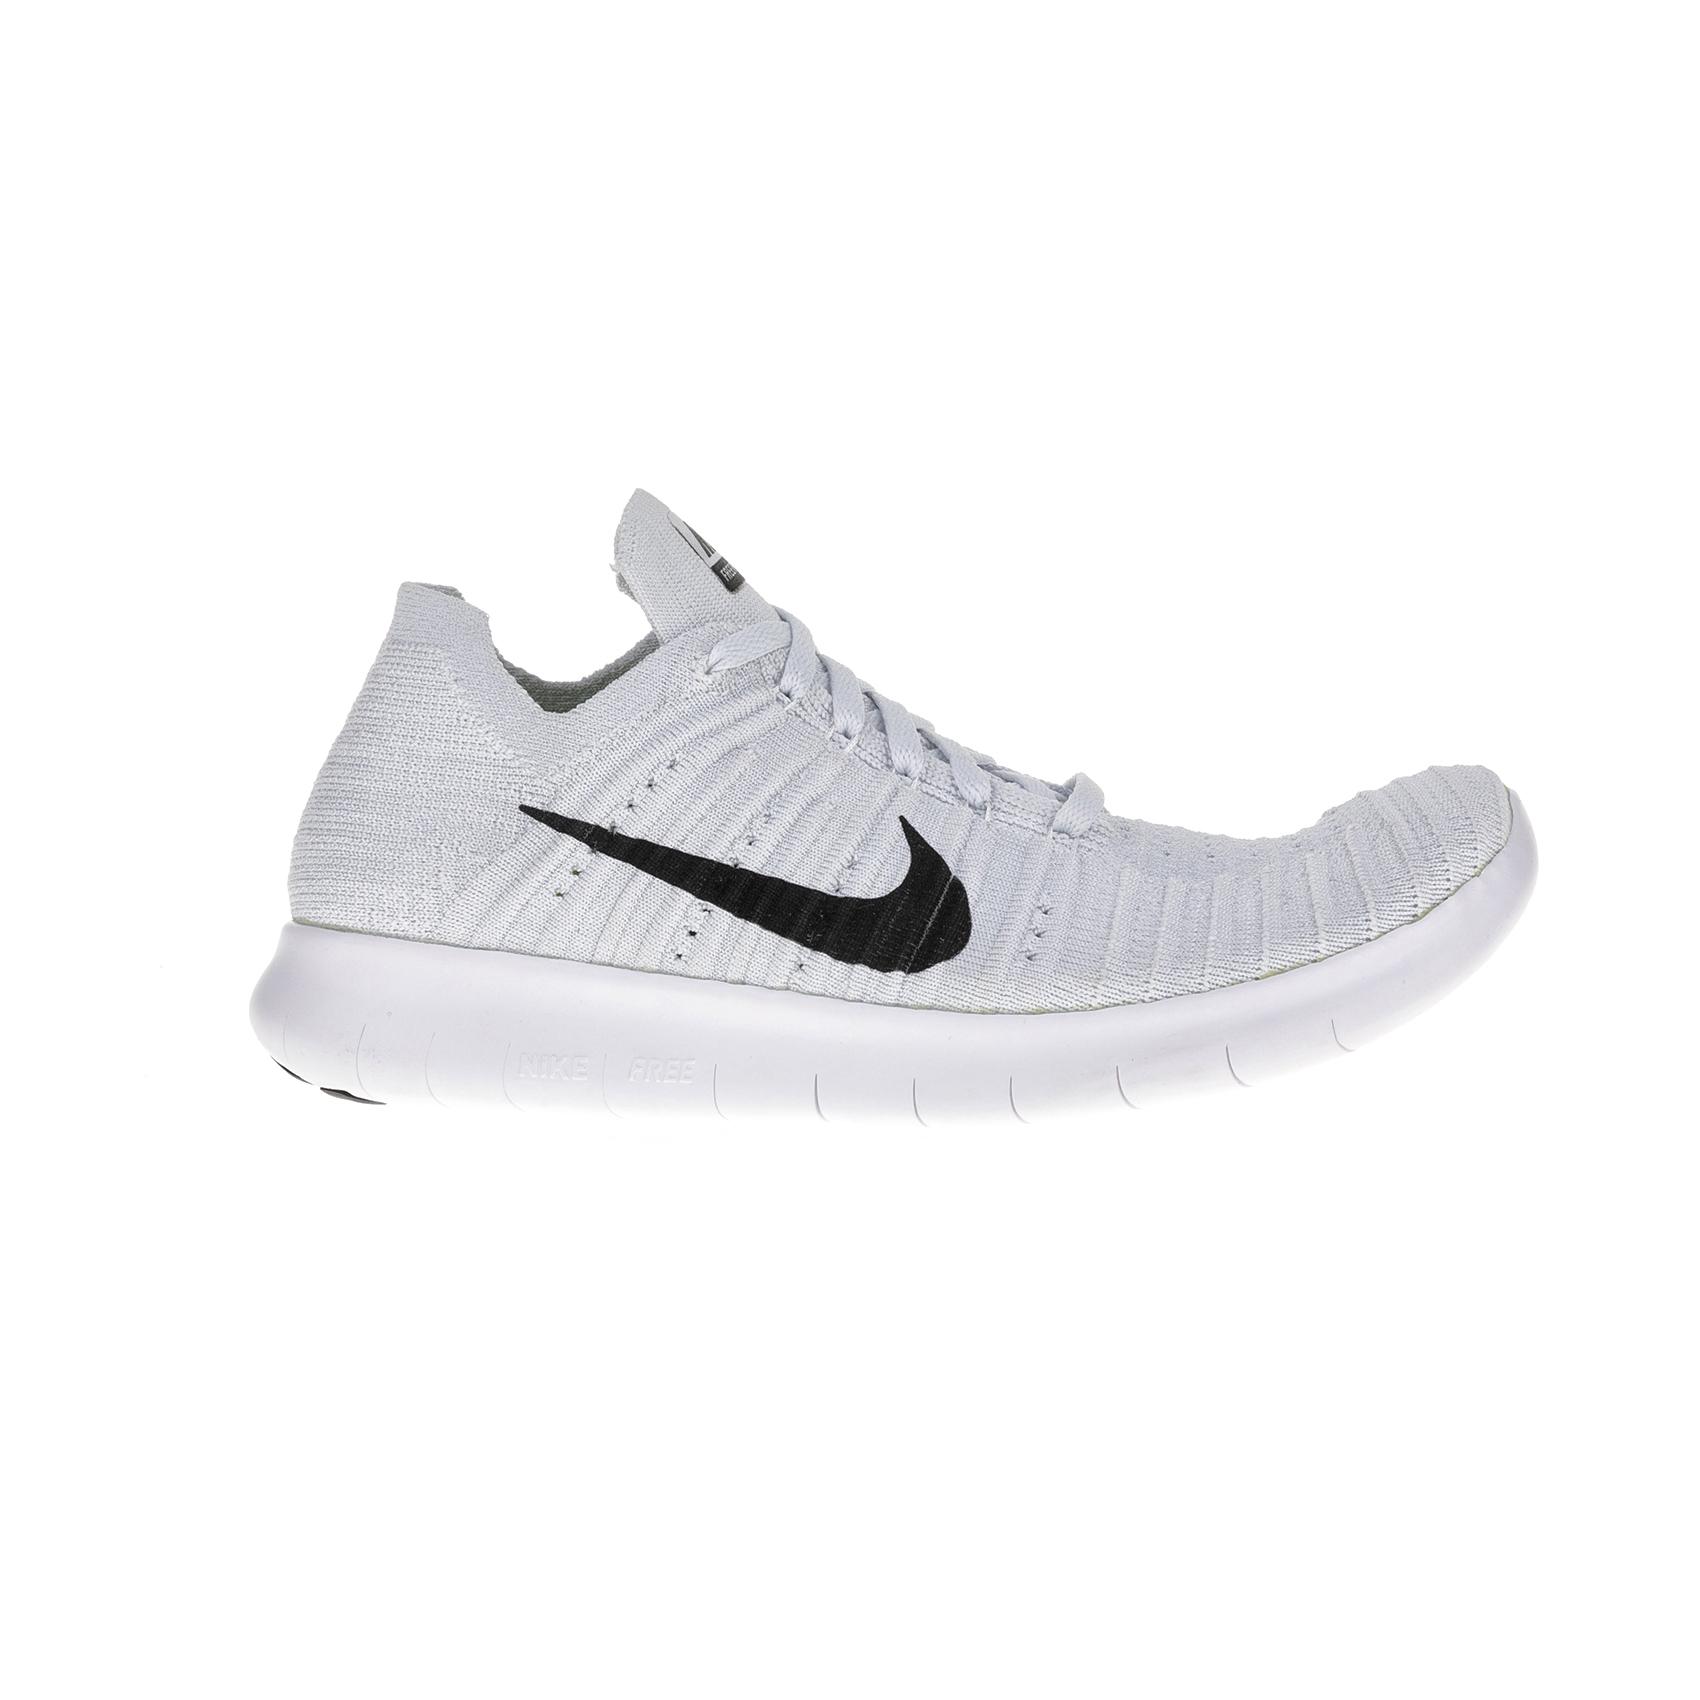 NIKE – Γυναικεία αθλητικά παπούτσια Nike FREE RN FLYKNIT λευκά